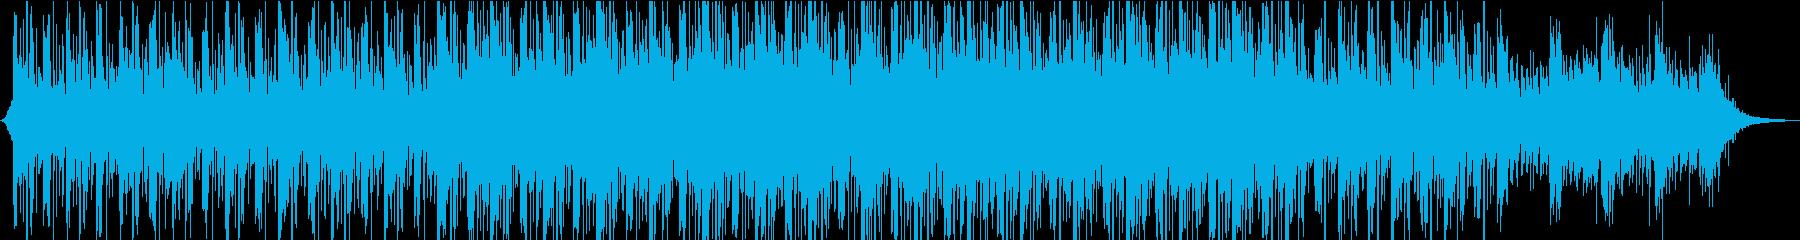 Background Soundscapの再生済みの波形